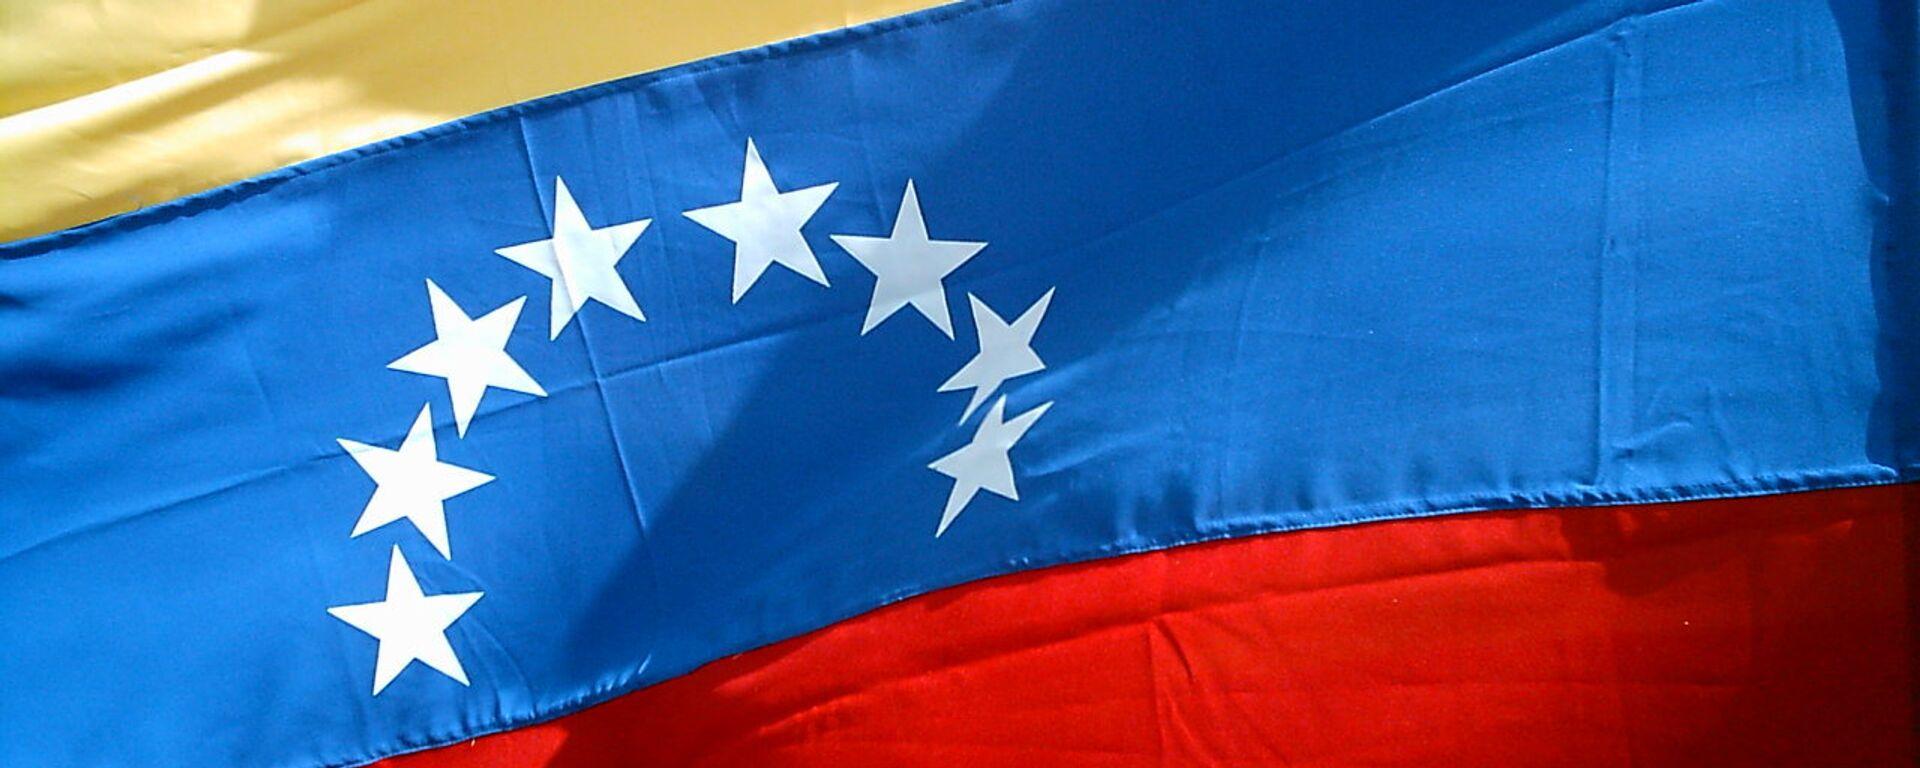 Bandera de Venezuela - Sputnik Mundo, 1920, 31.01.2021